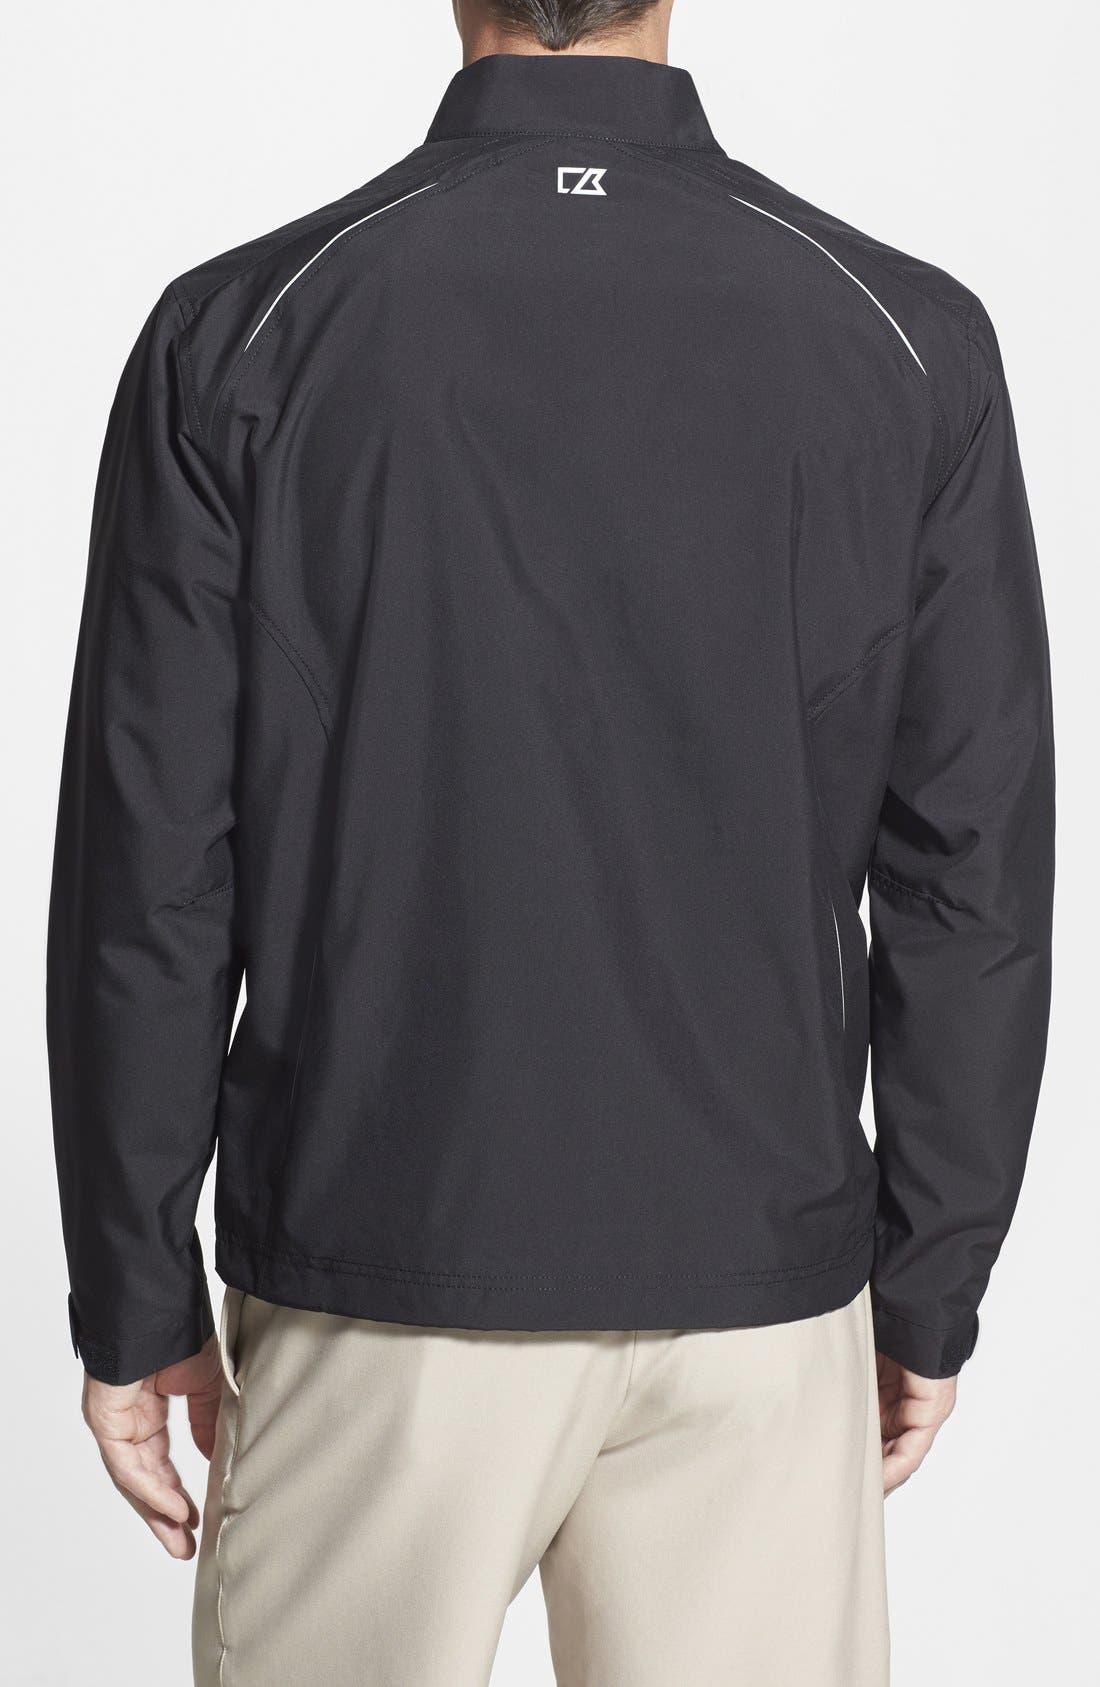 Oakland Raiders - Beacon WeatherTec Wind & Water Resistant Jacket,                             Alternate thumbnail 2, color,                             Black